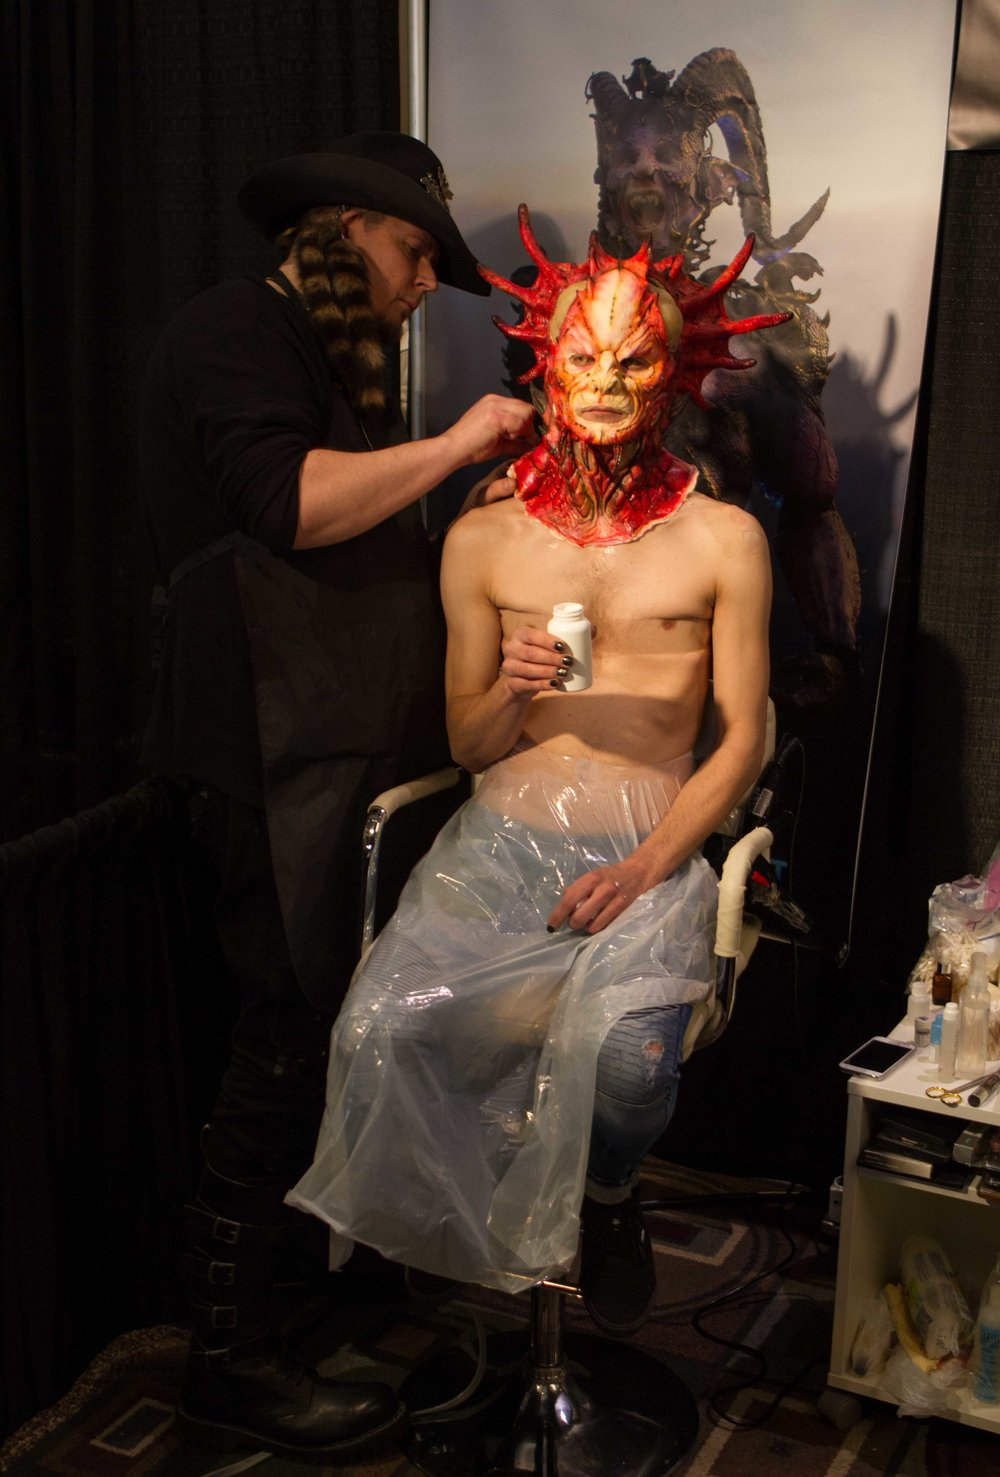 IMATS 2017 - FX Creator Josef Rarach & Vlad Taupesh Fantasy Special Effects Makeup (www.creativecastlestudios.com:fx-creator - www.KyleReaArt.com - www.KyleReaPhotography.com) 35.jpg